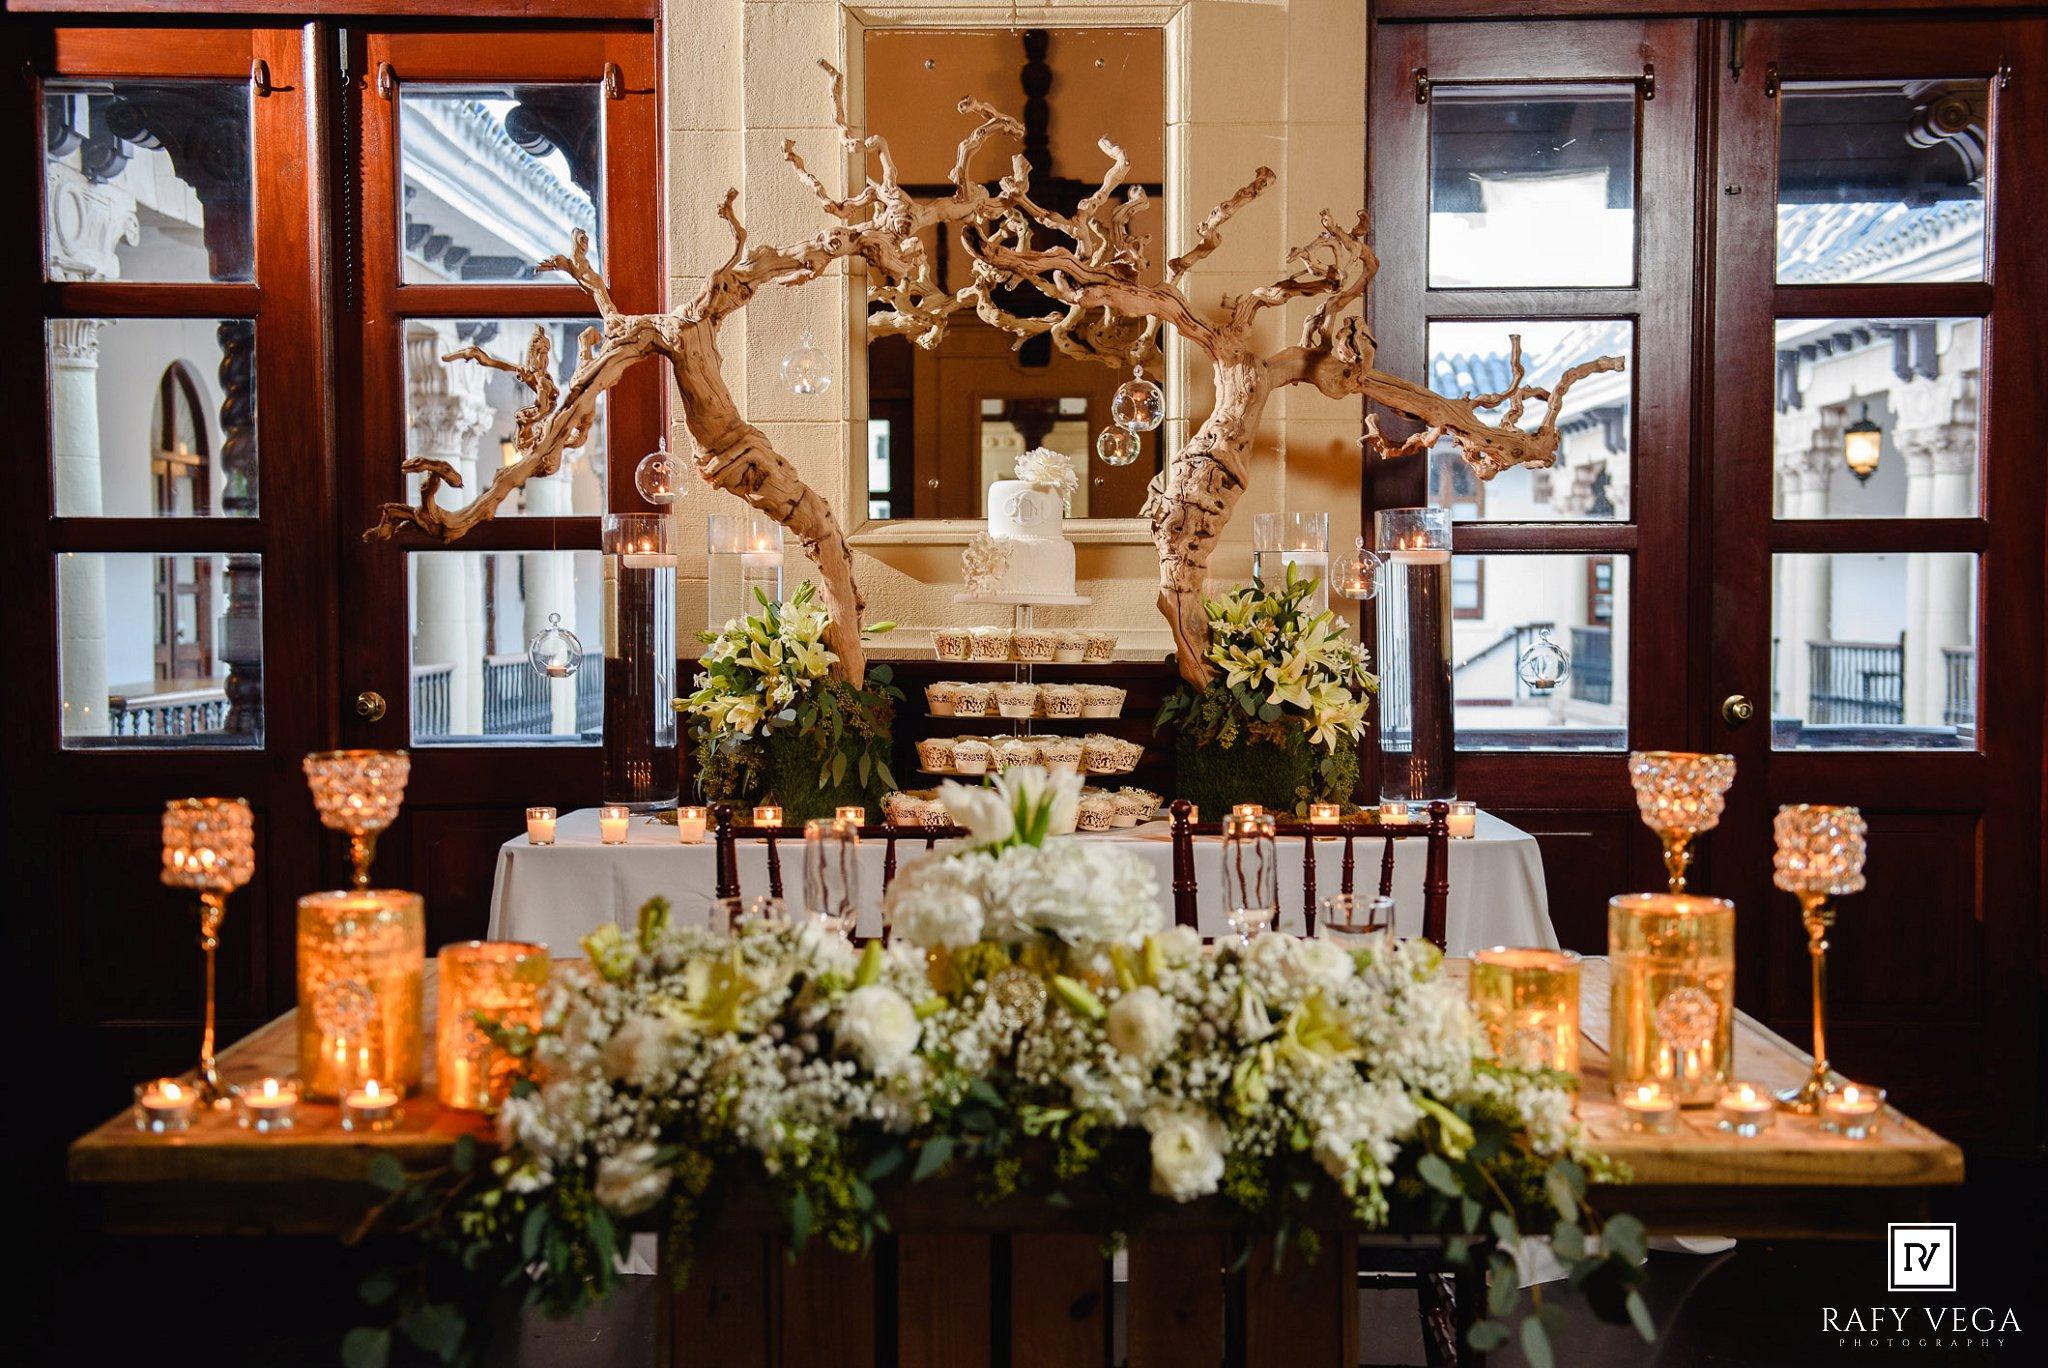 Rom ntica boda en casa espa a viejo san juan - Decoracion en espana ...